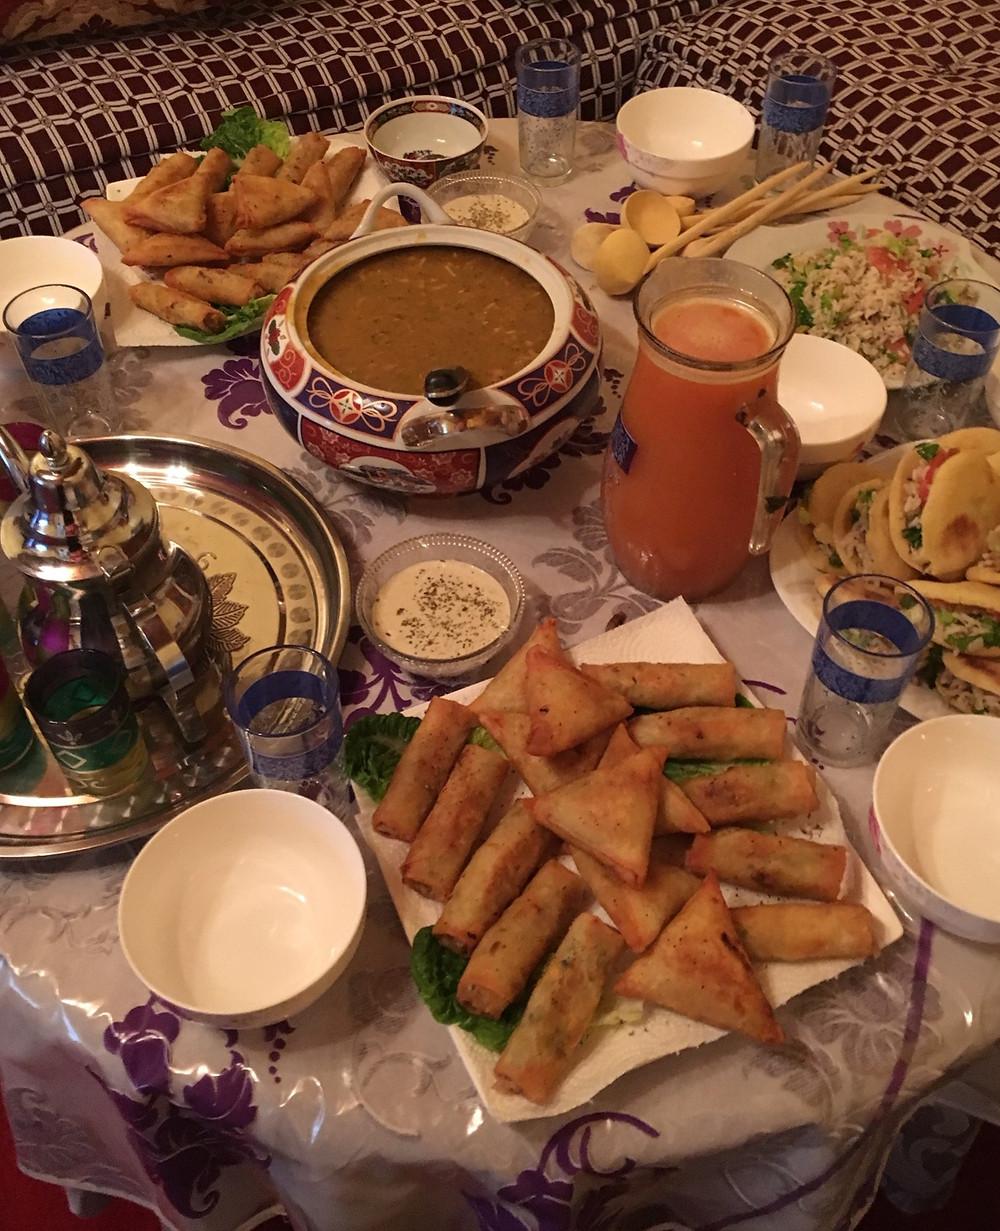 Moroccan Ftour during Ramadan